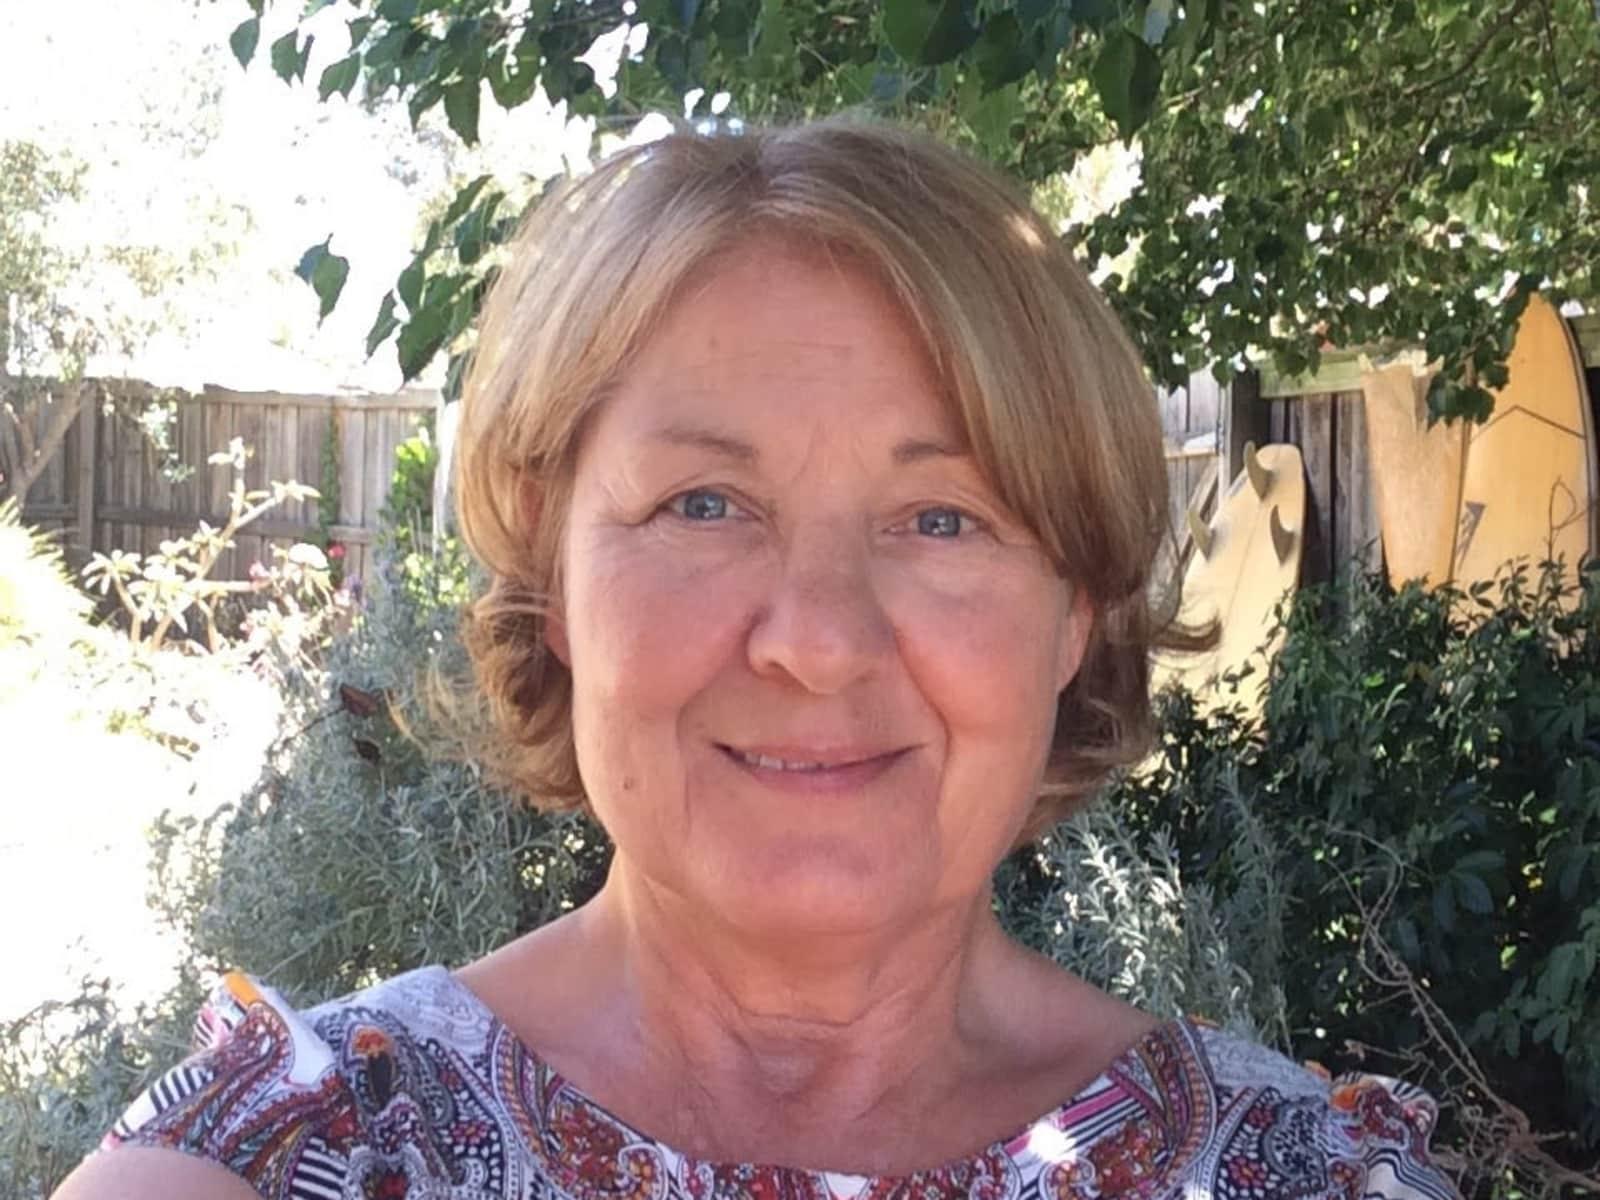 Eileen from Margaret River, Western Australia, Australia